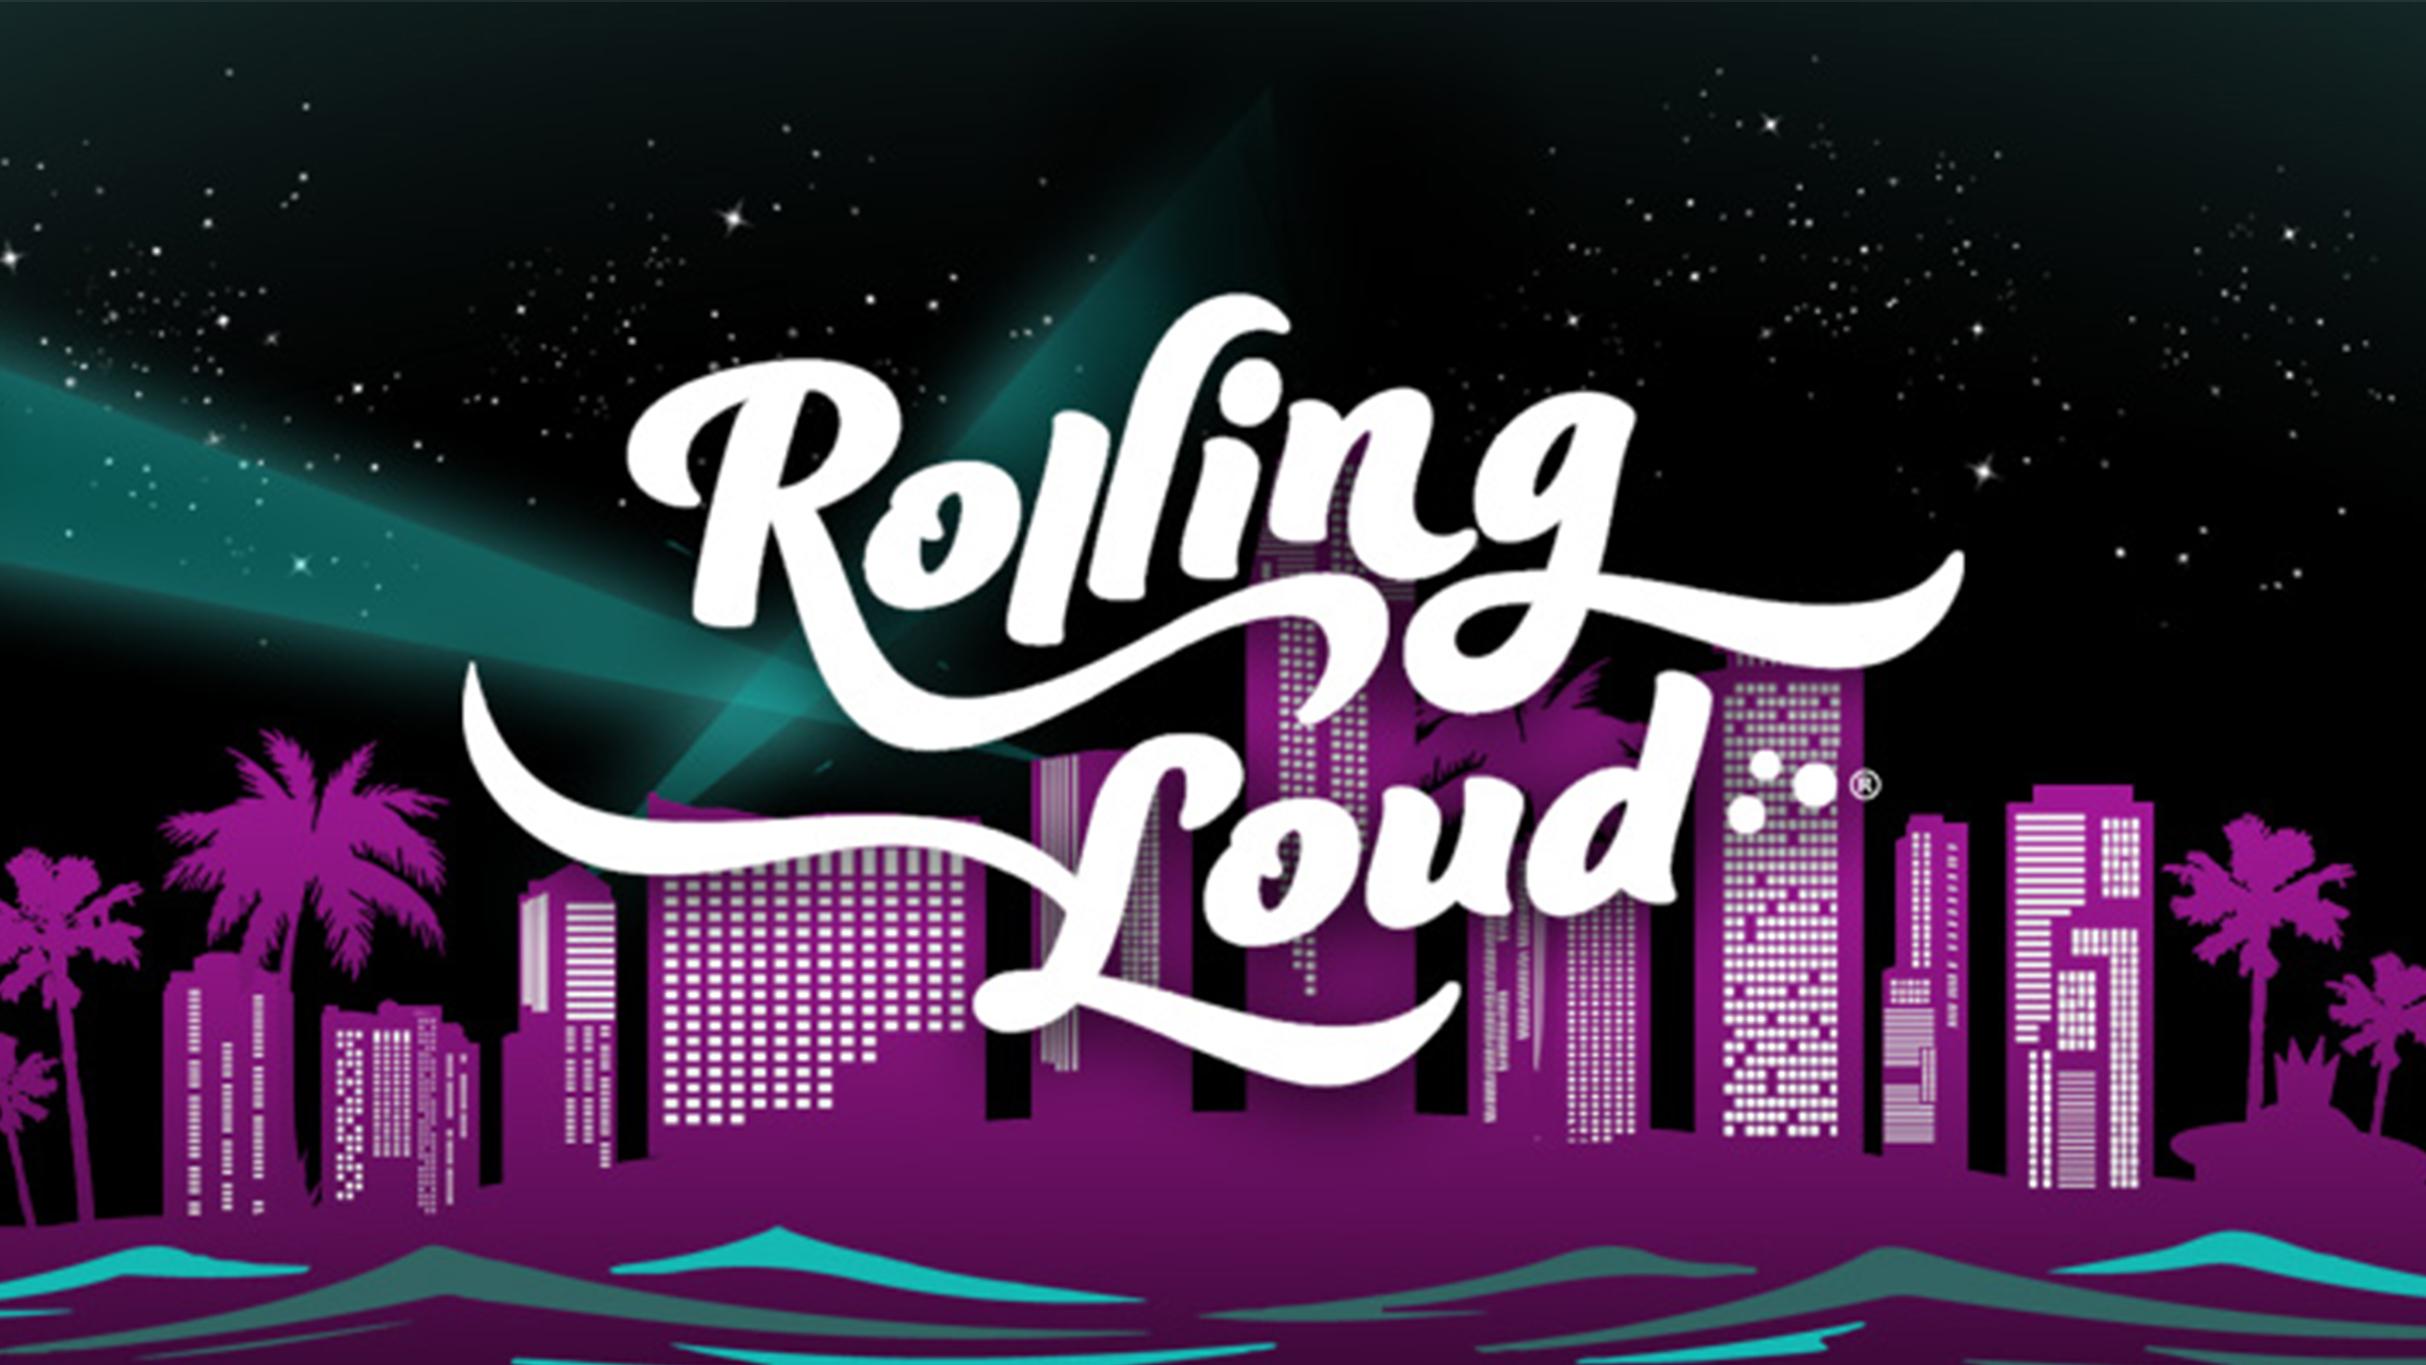 RollingLoud fest miami